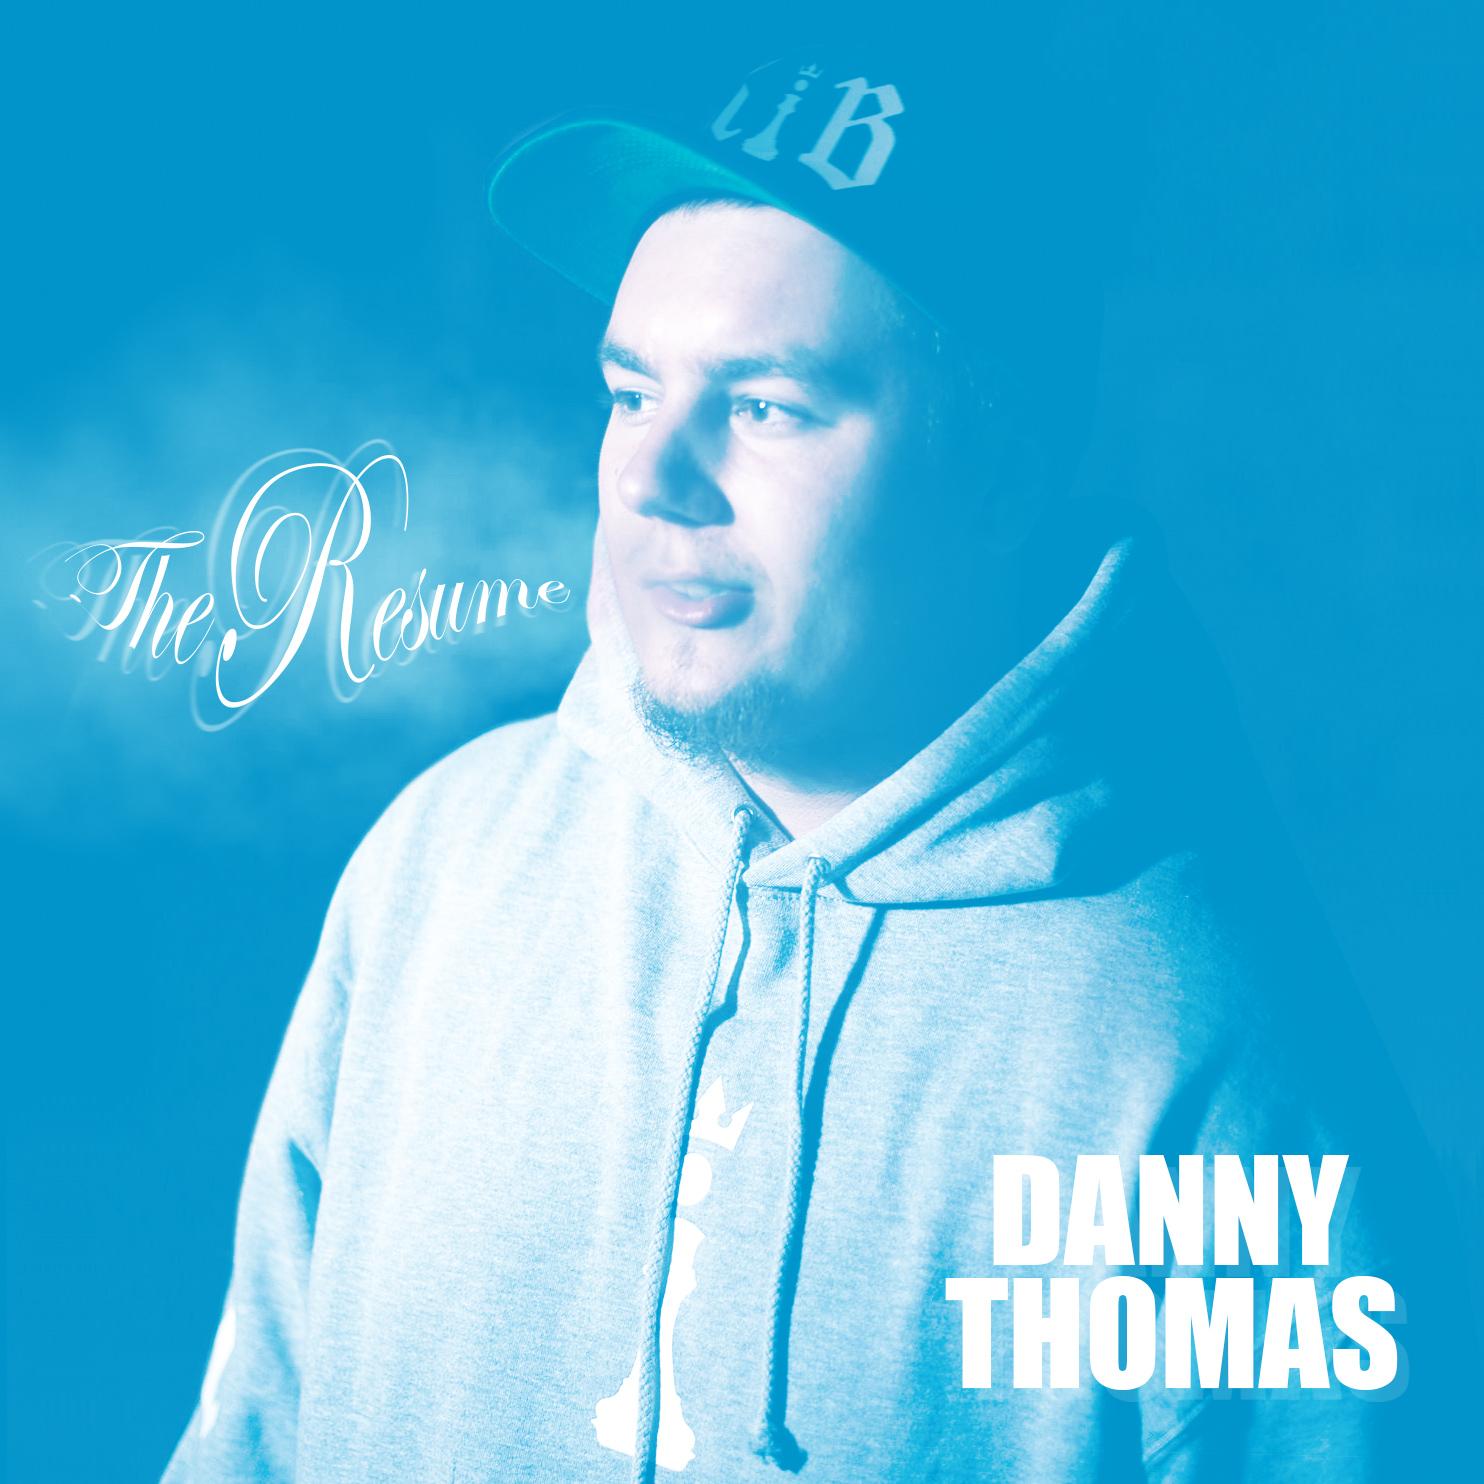 Danny-Thomas-The-Resume_part-1.jpg